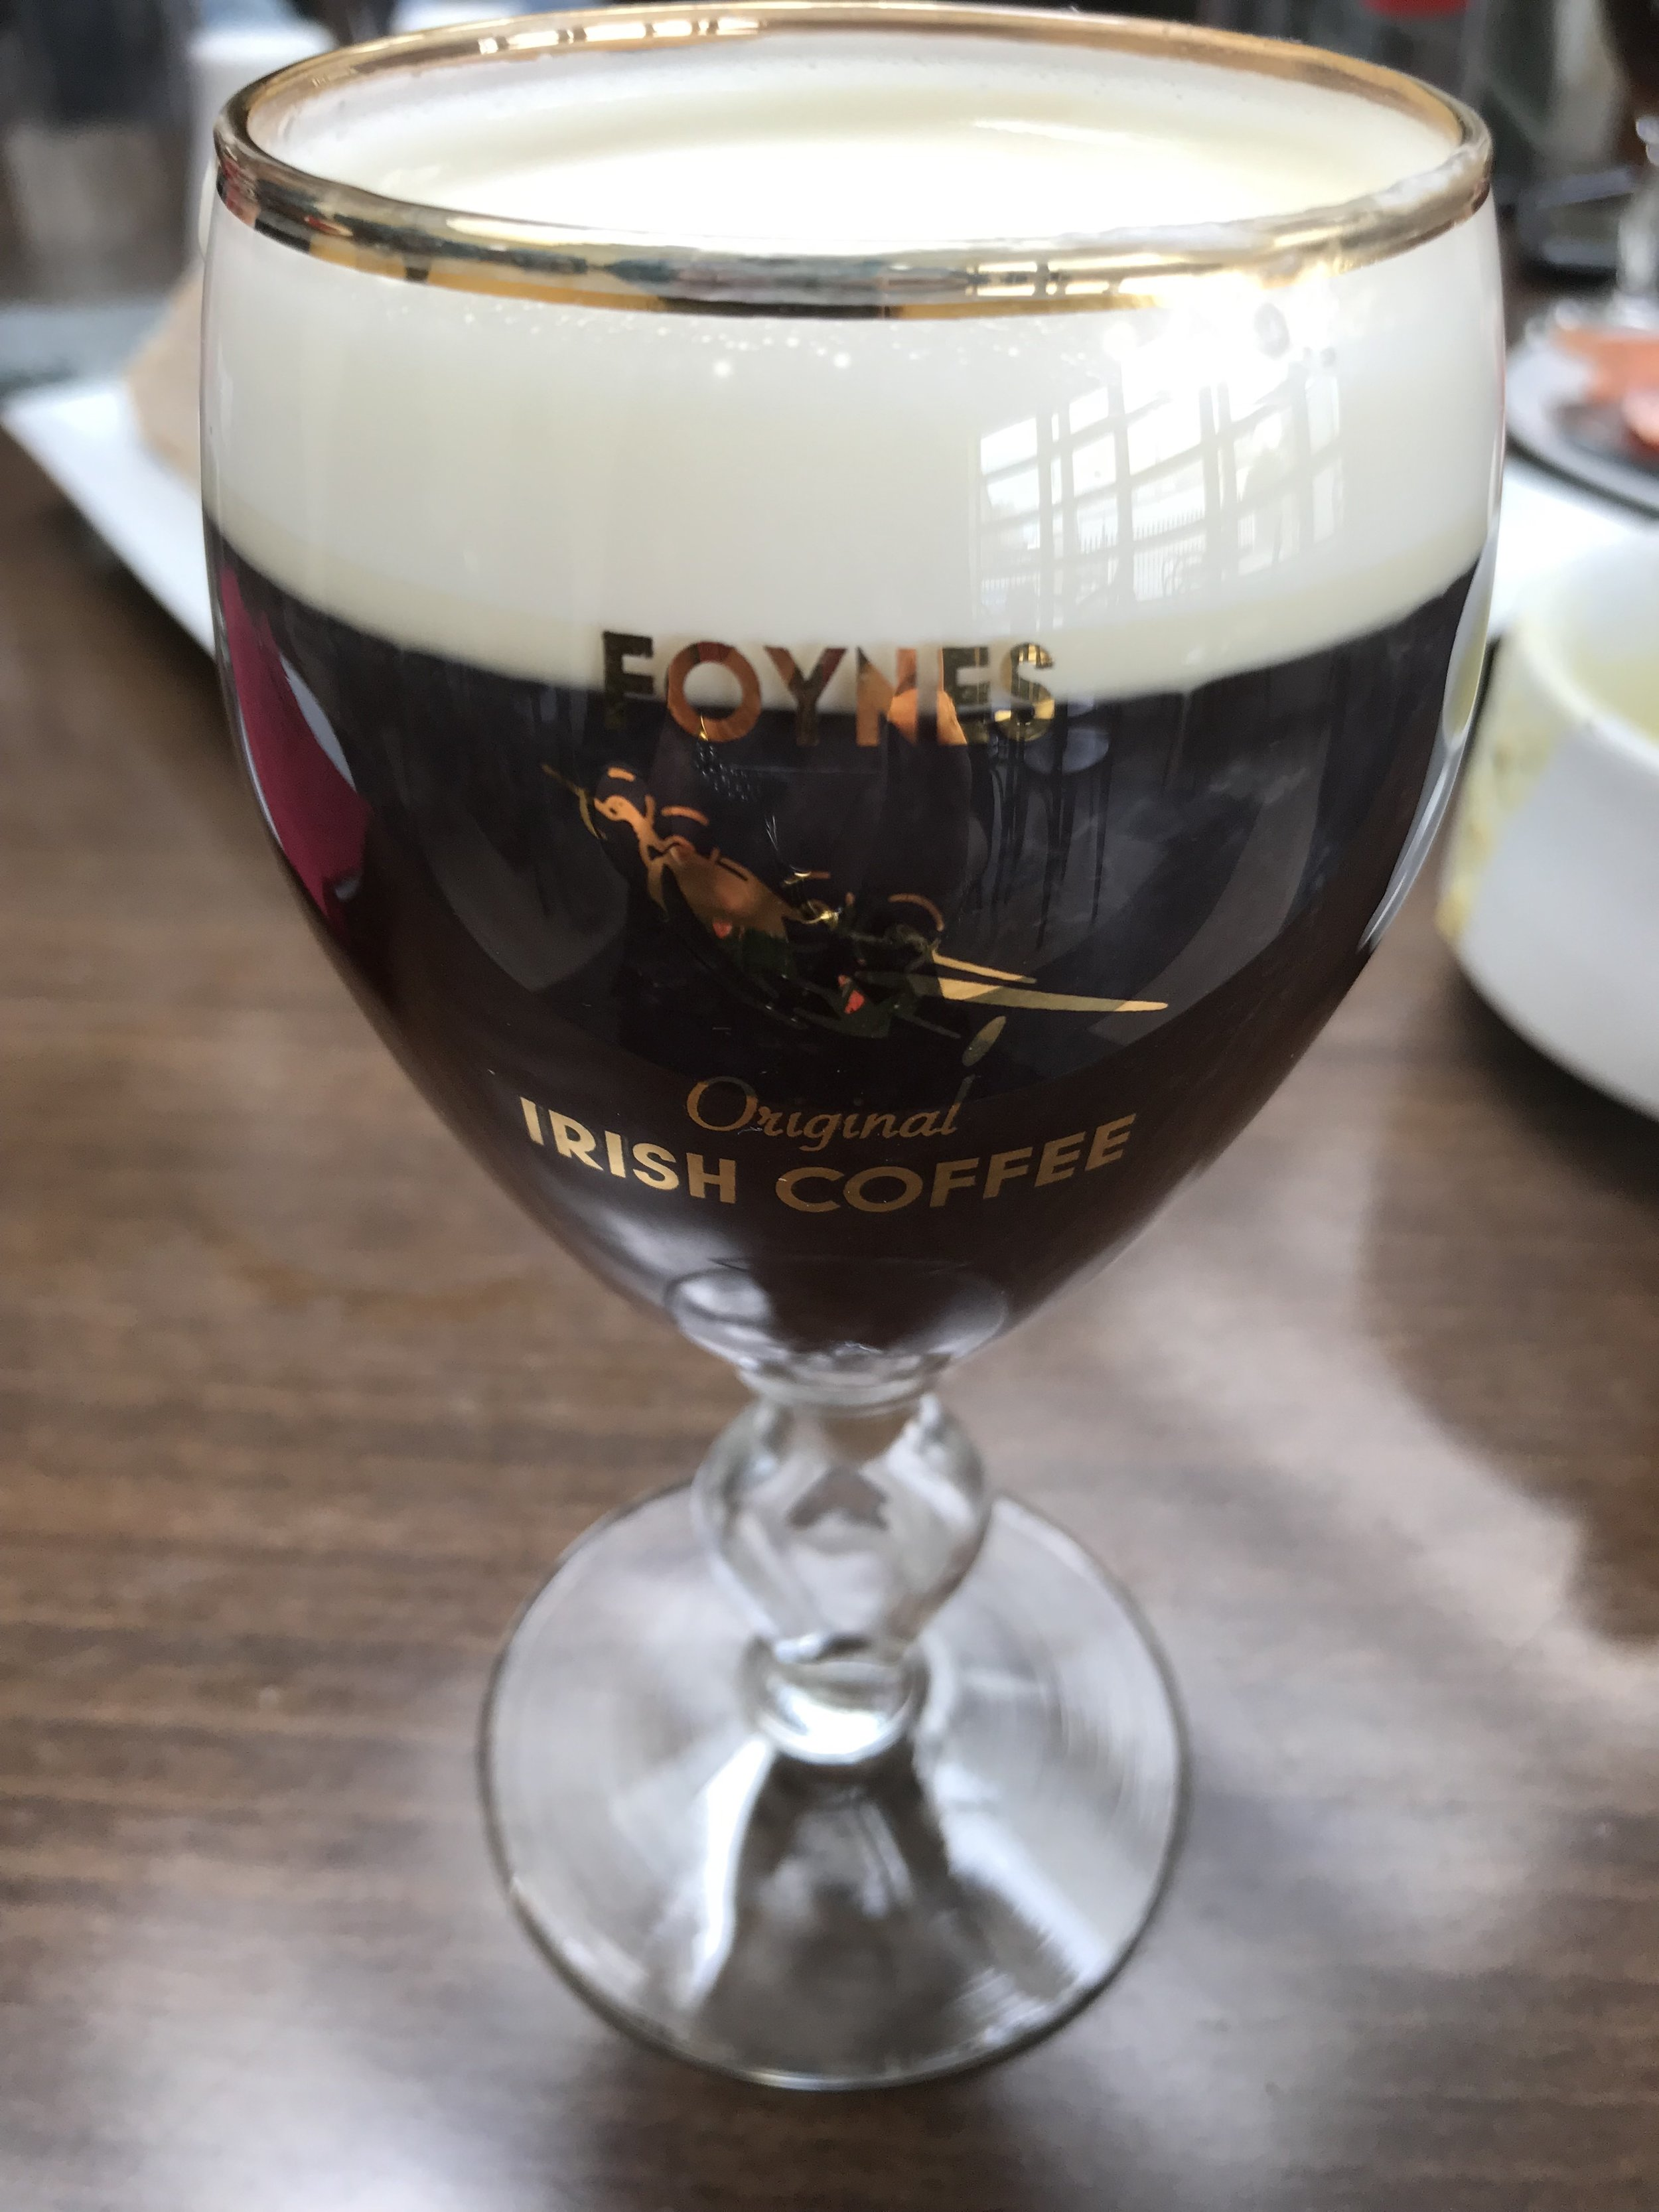 An Irish Coffee at the source